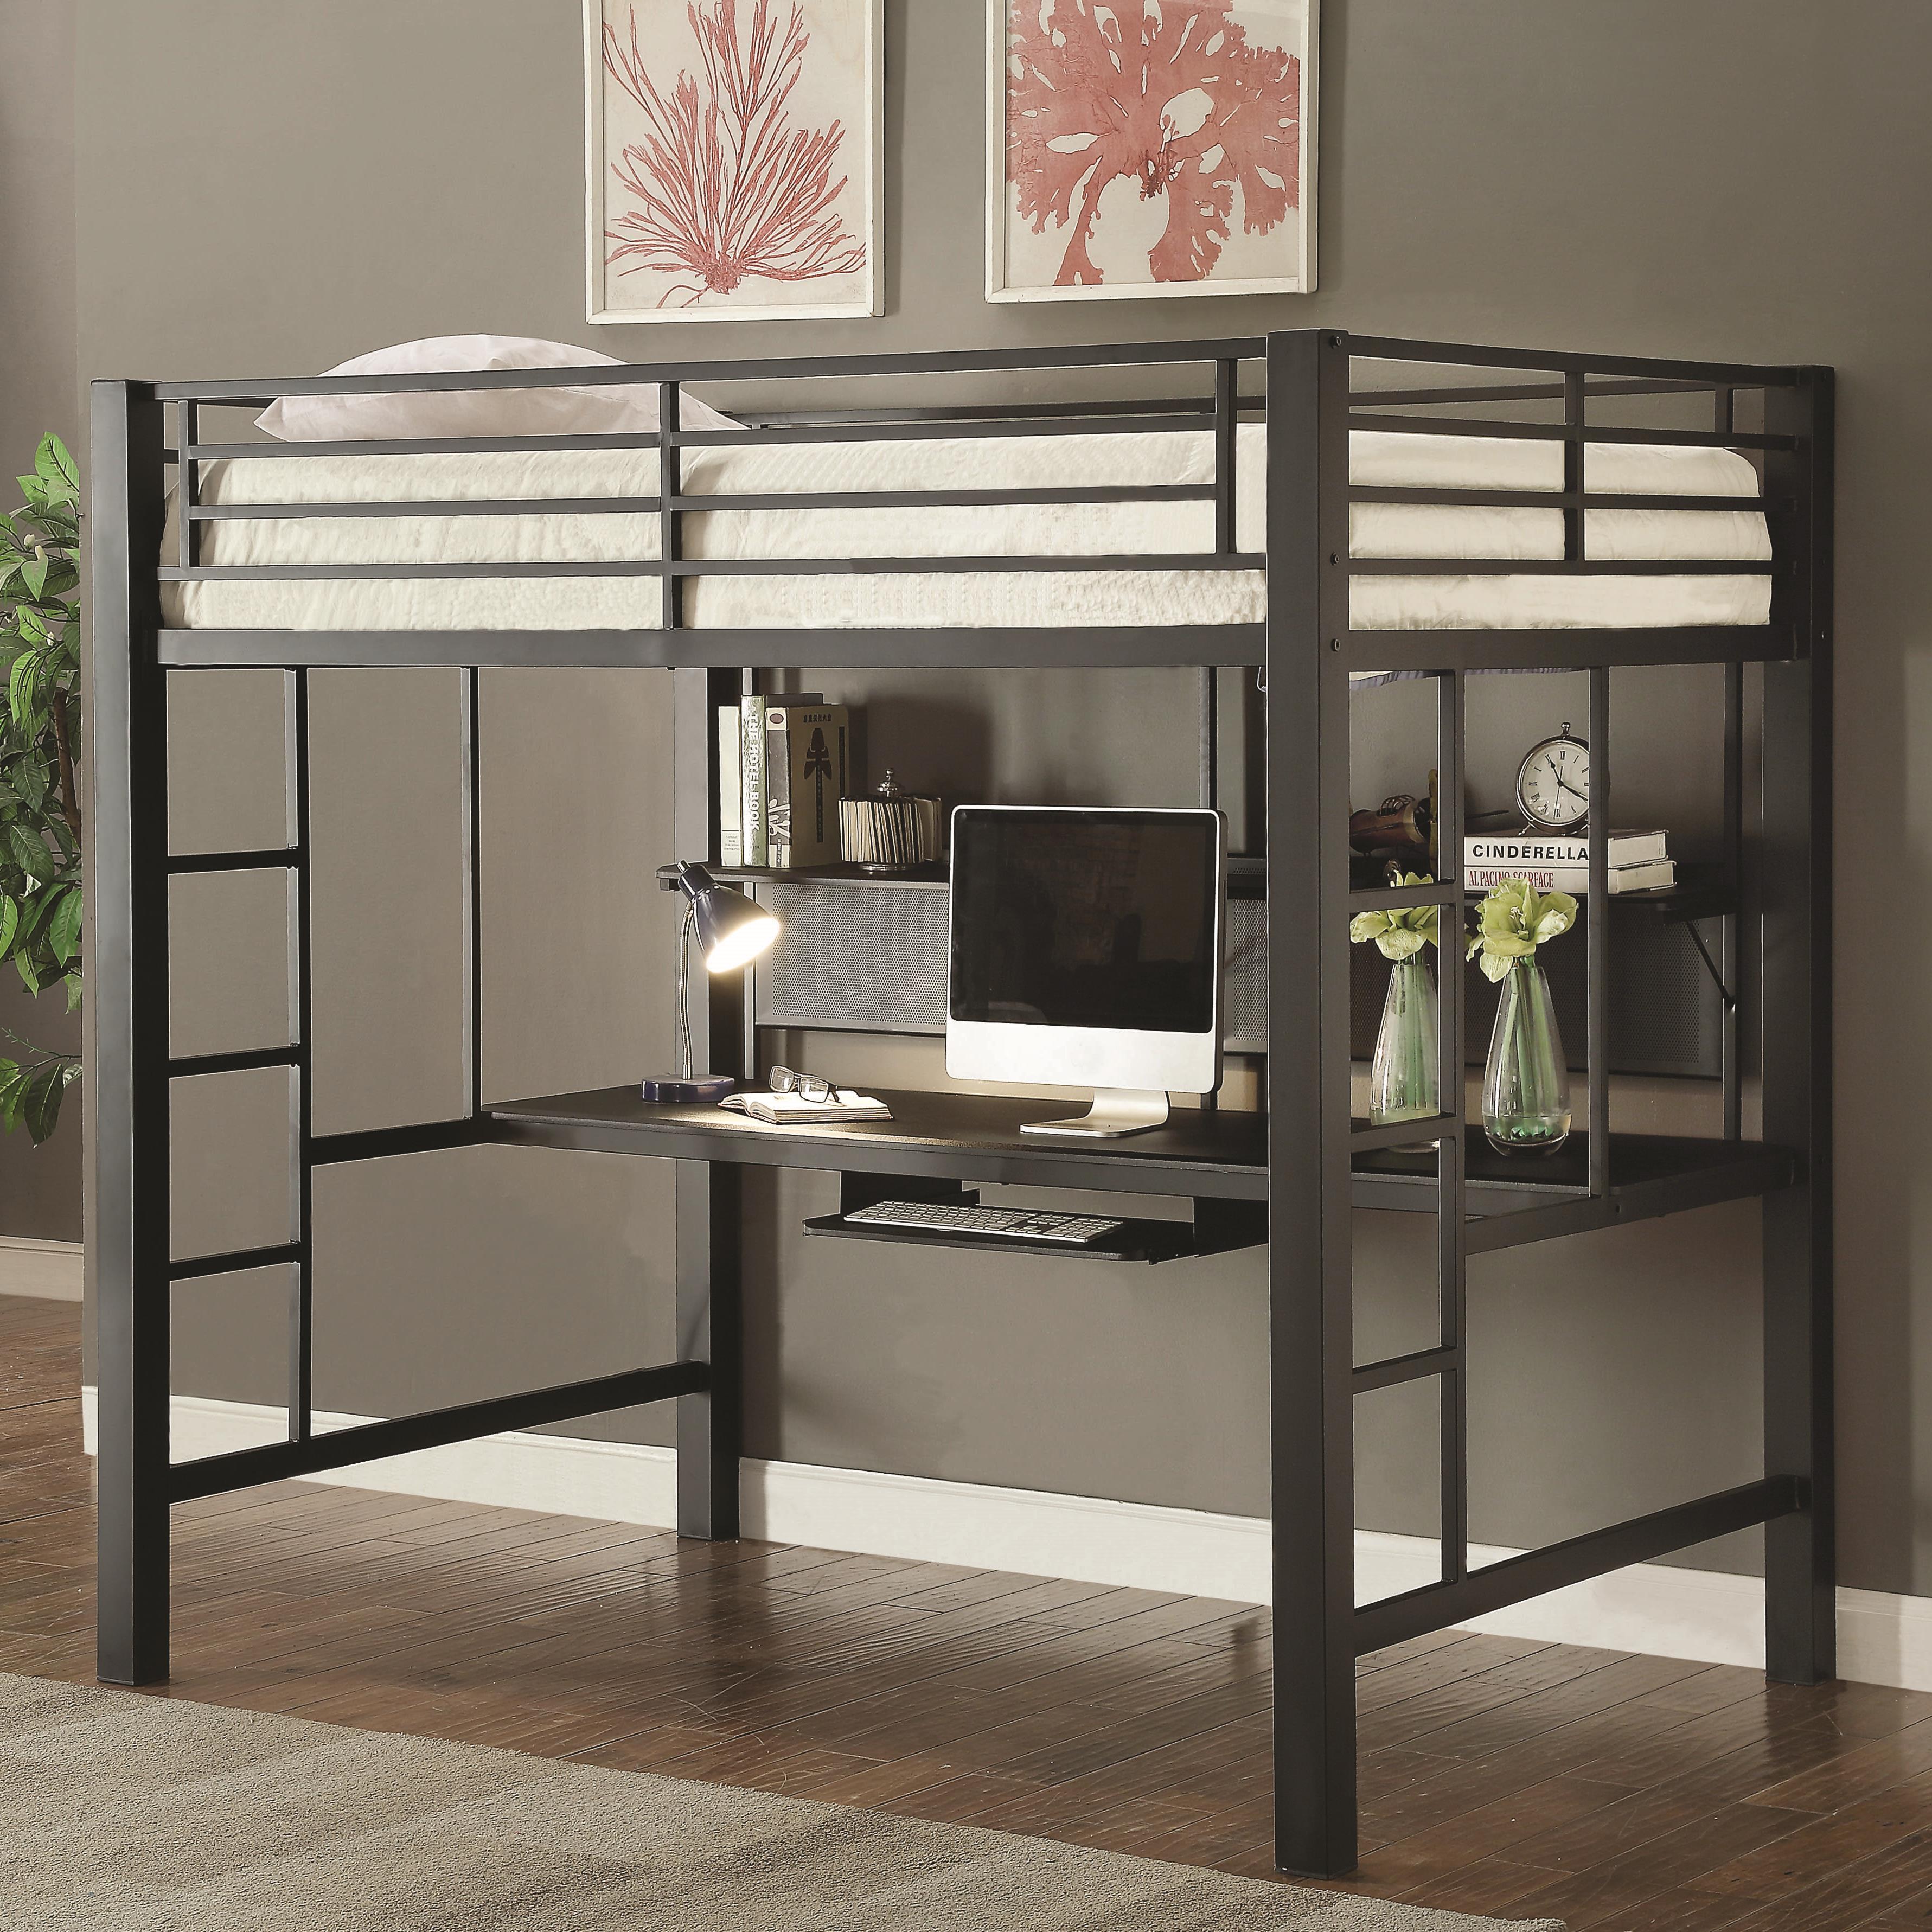 Coaster Bunks Workstation Full Loft Bed Value City